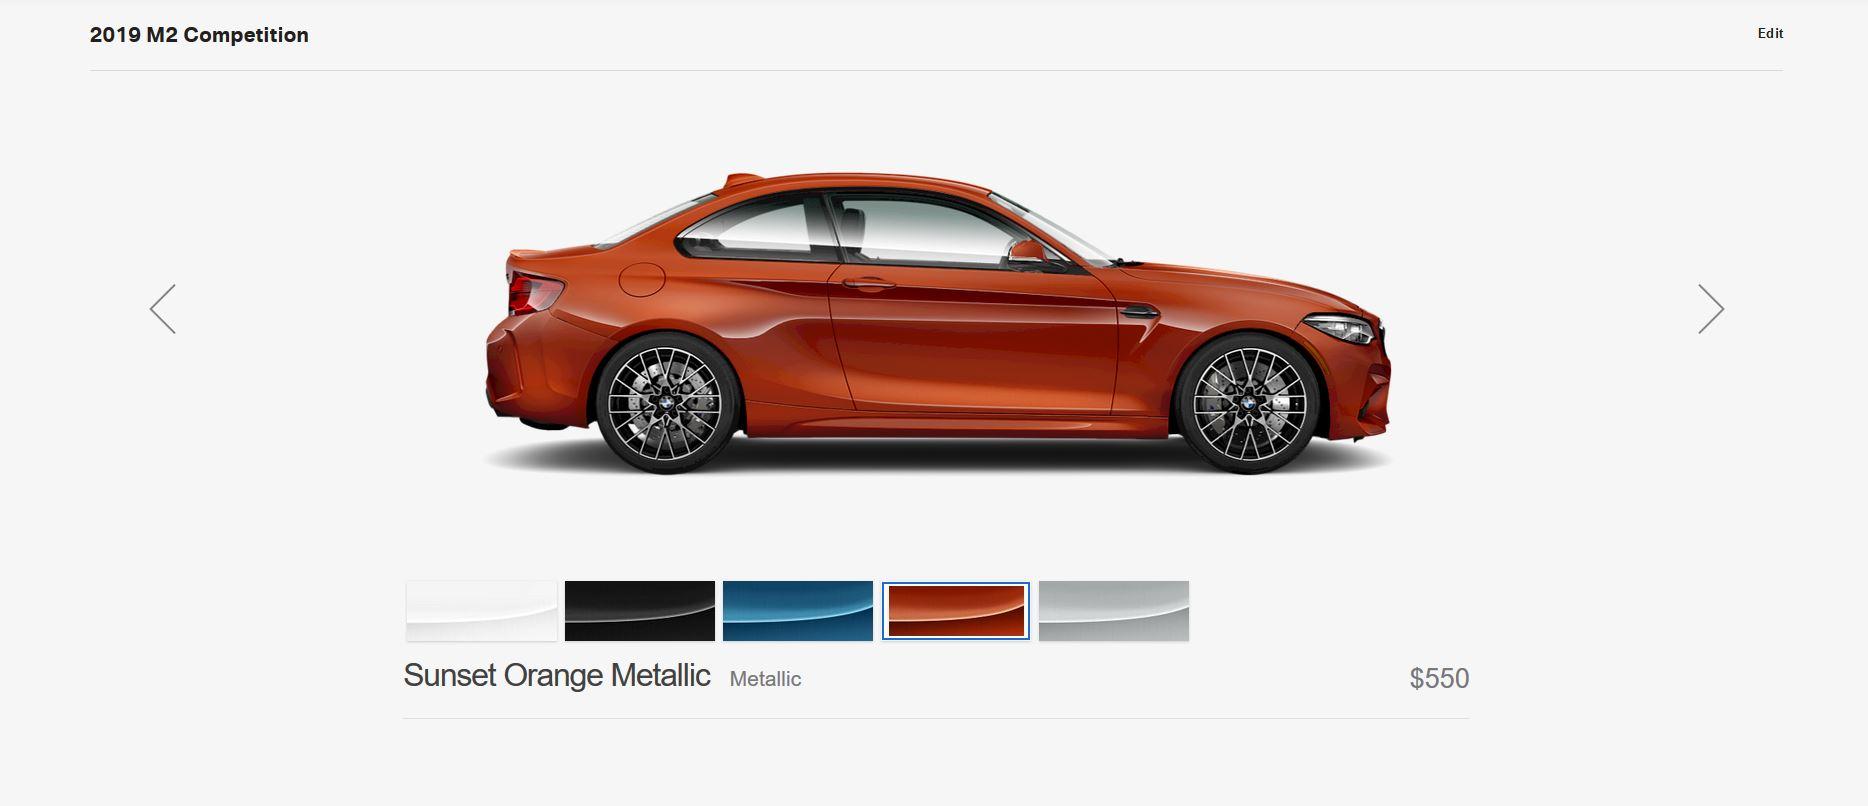 BMW m2 Competition sunset orange